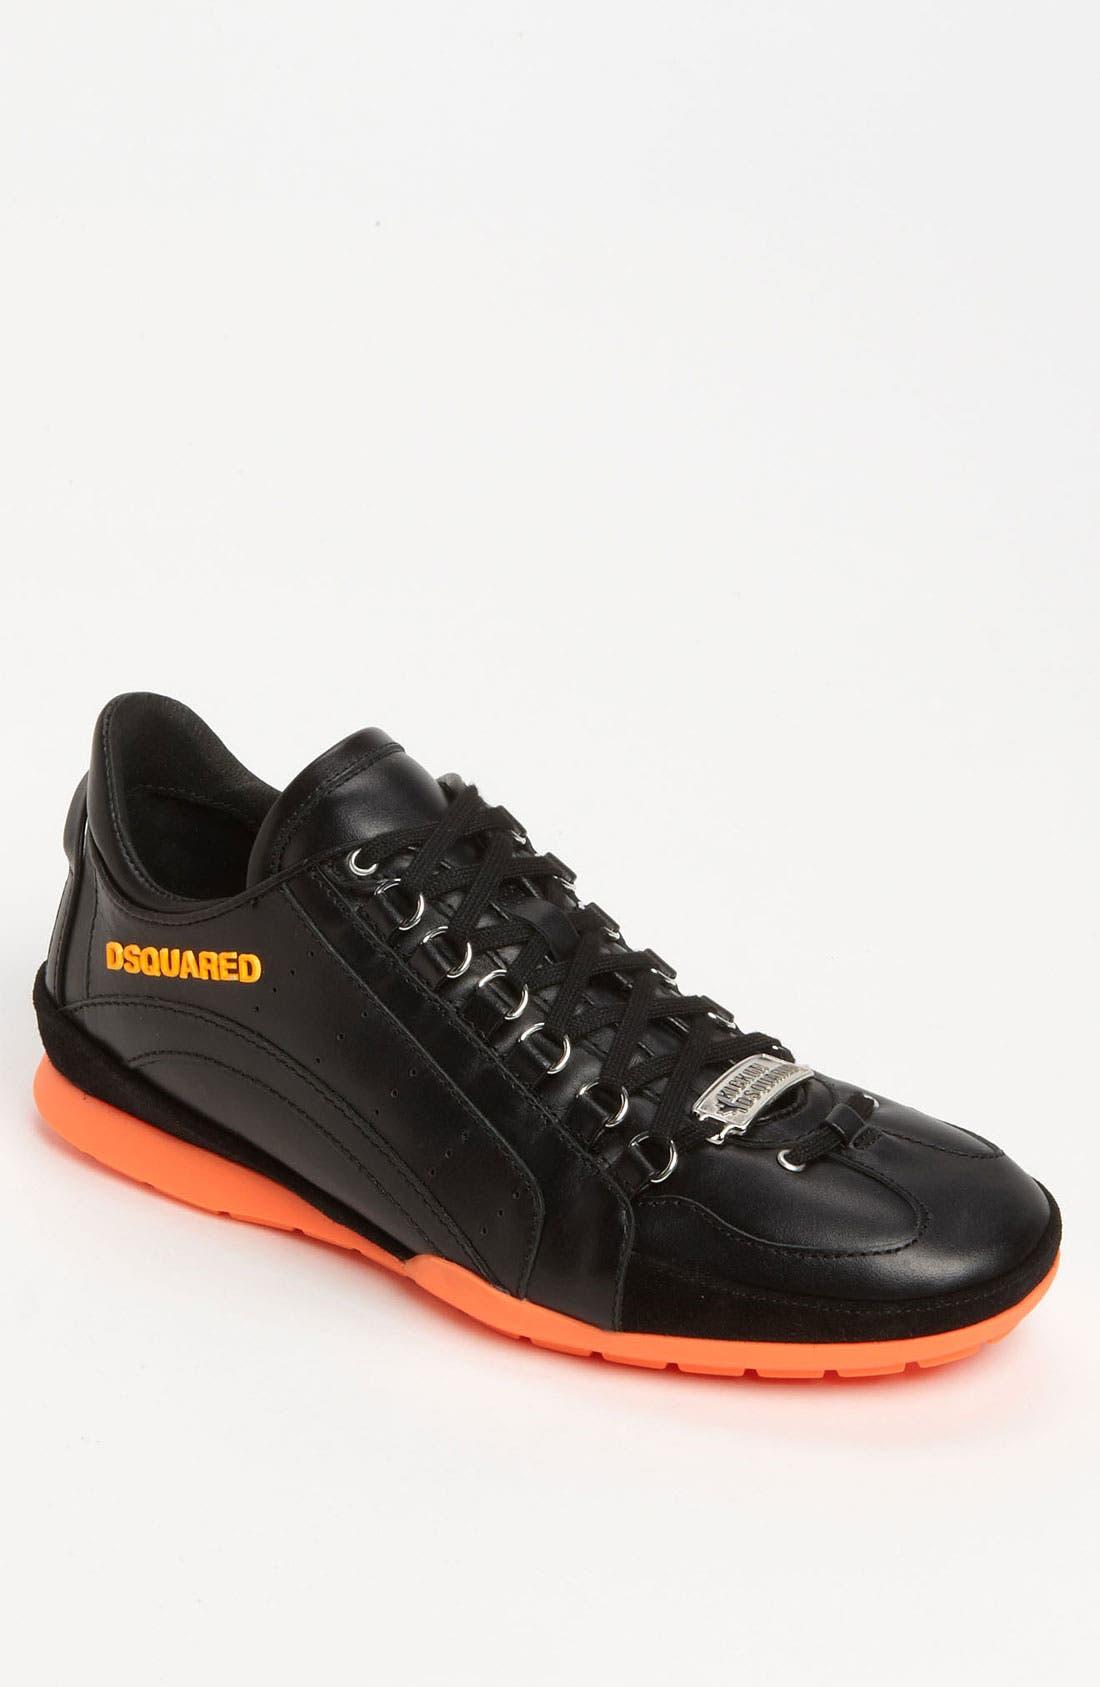 Alternate Image 1 Selected - Dsquared2 '553' Sneaker